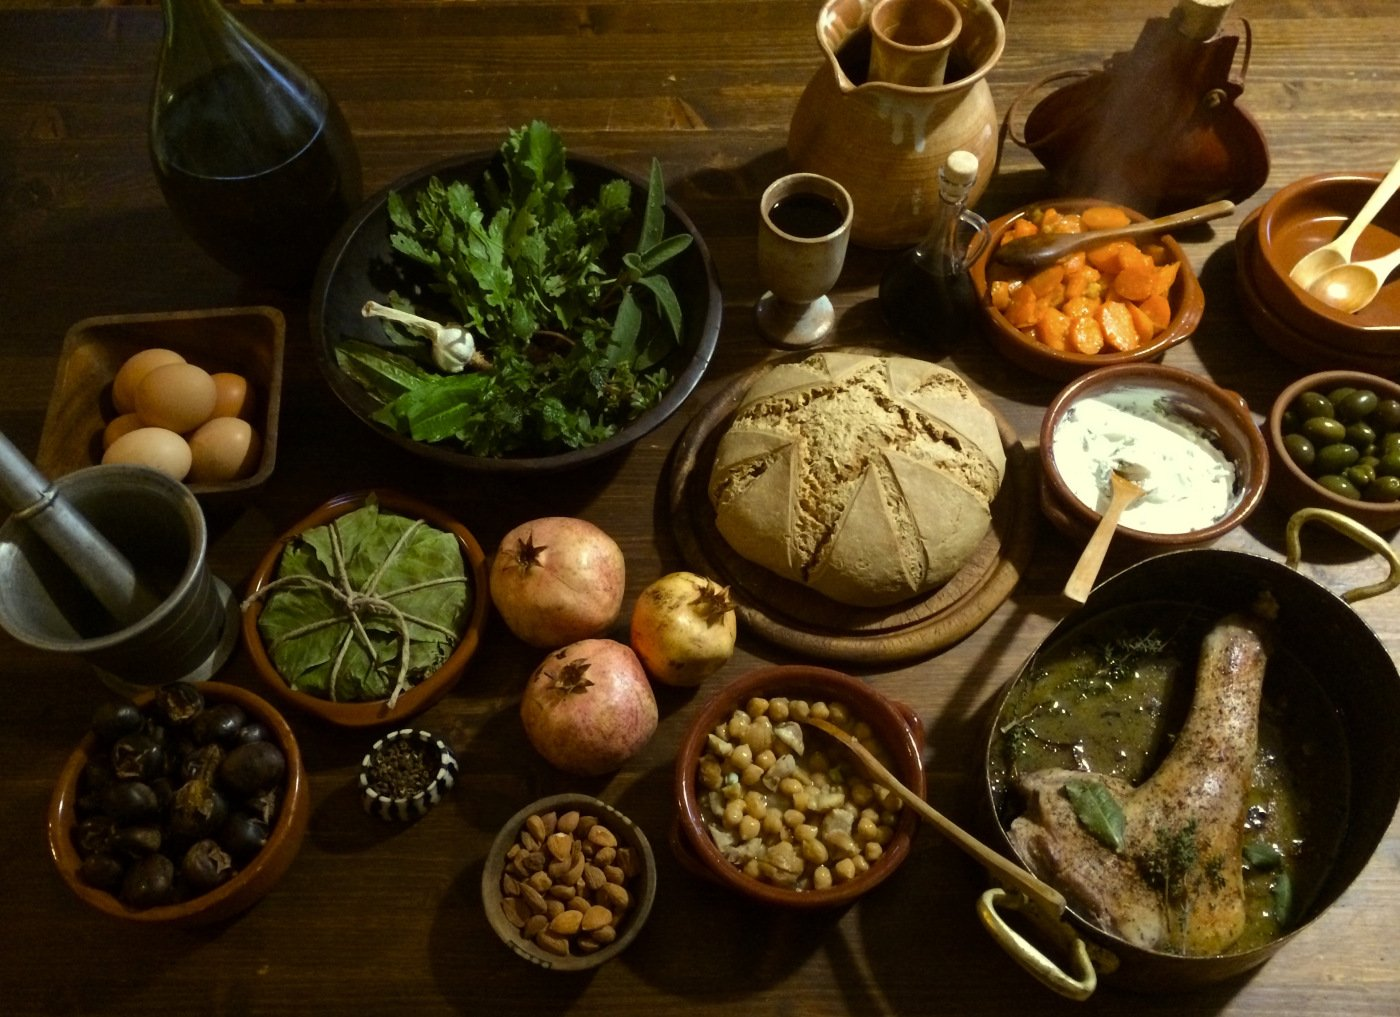 La cucina romana ieri vs oggi la cucina romana ieri vs oggi for Cucina romana antica